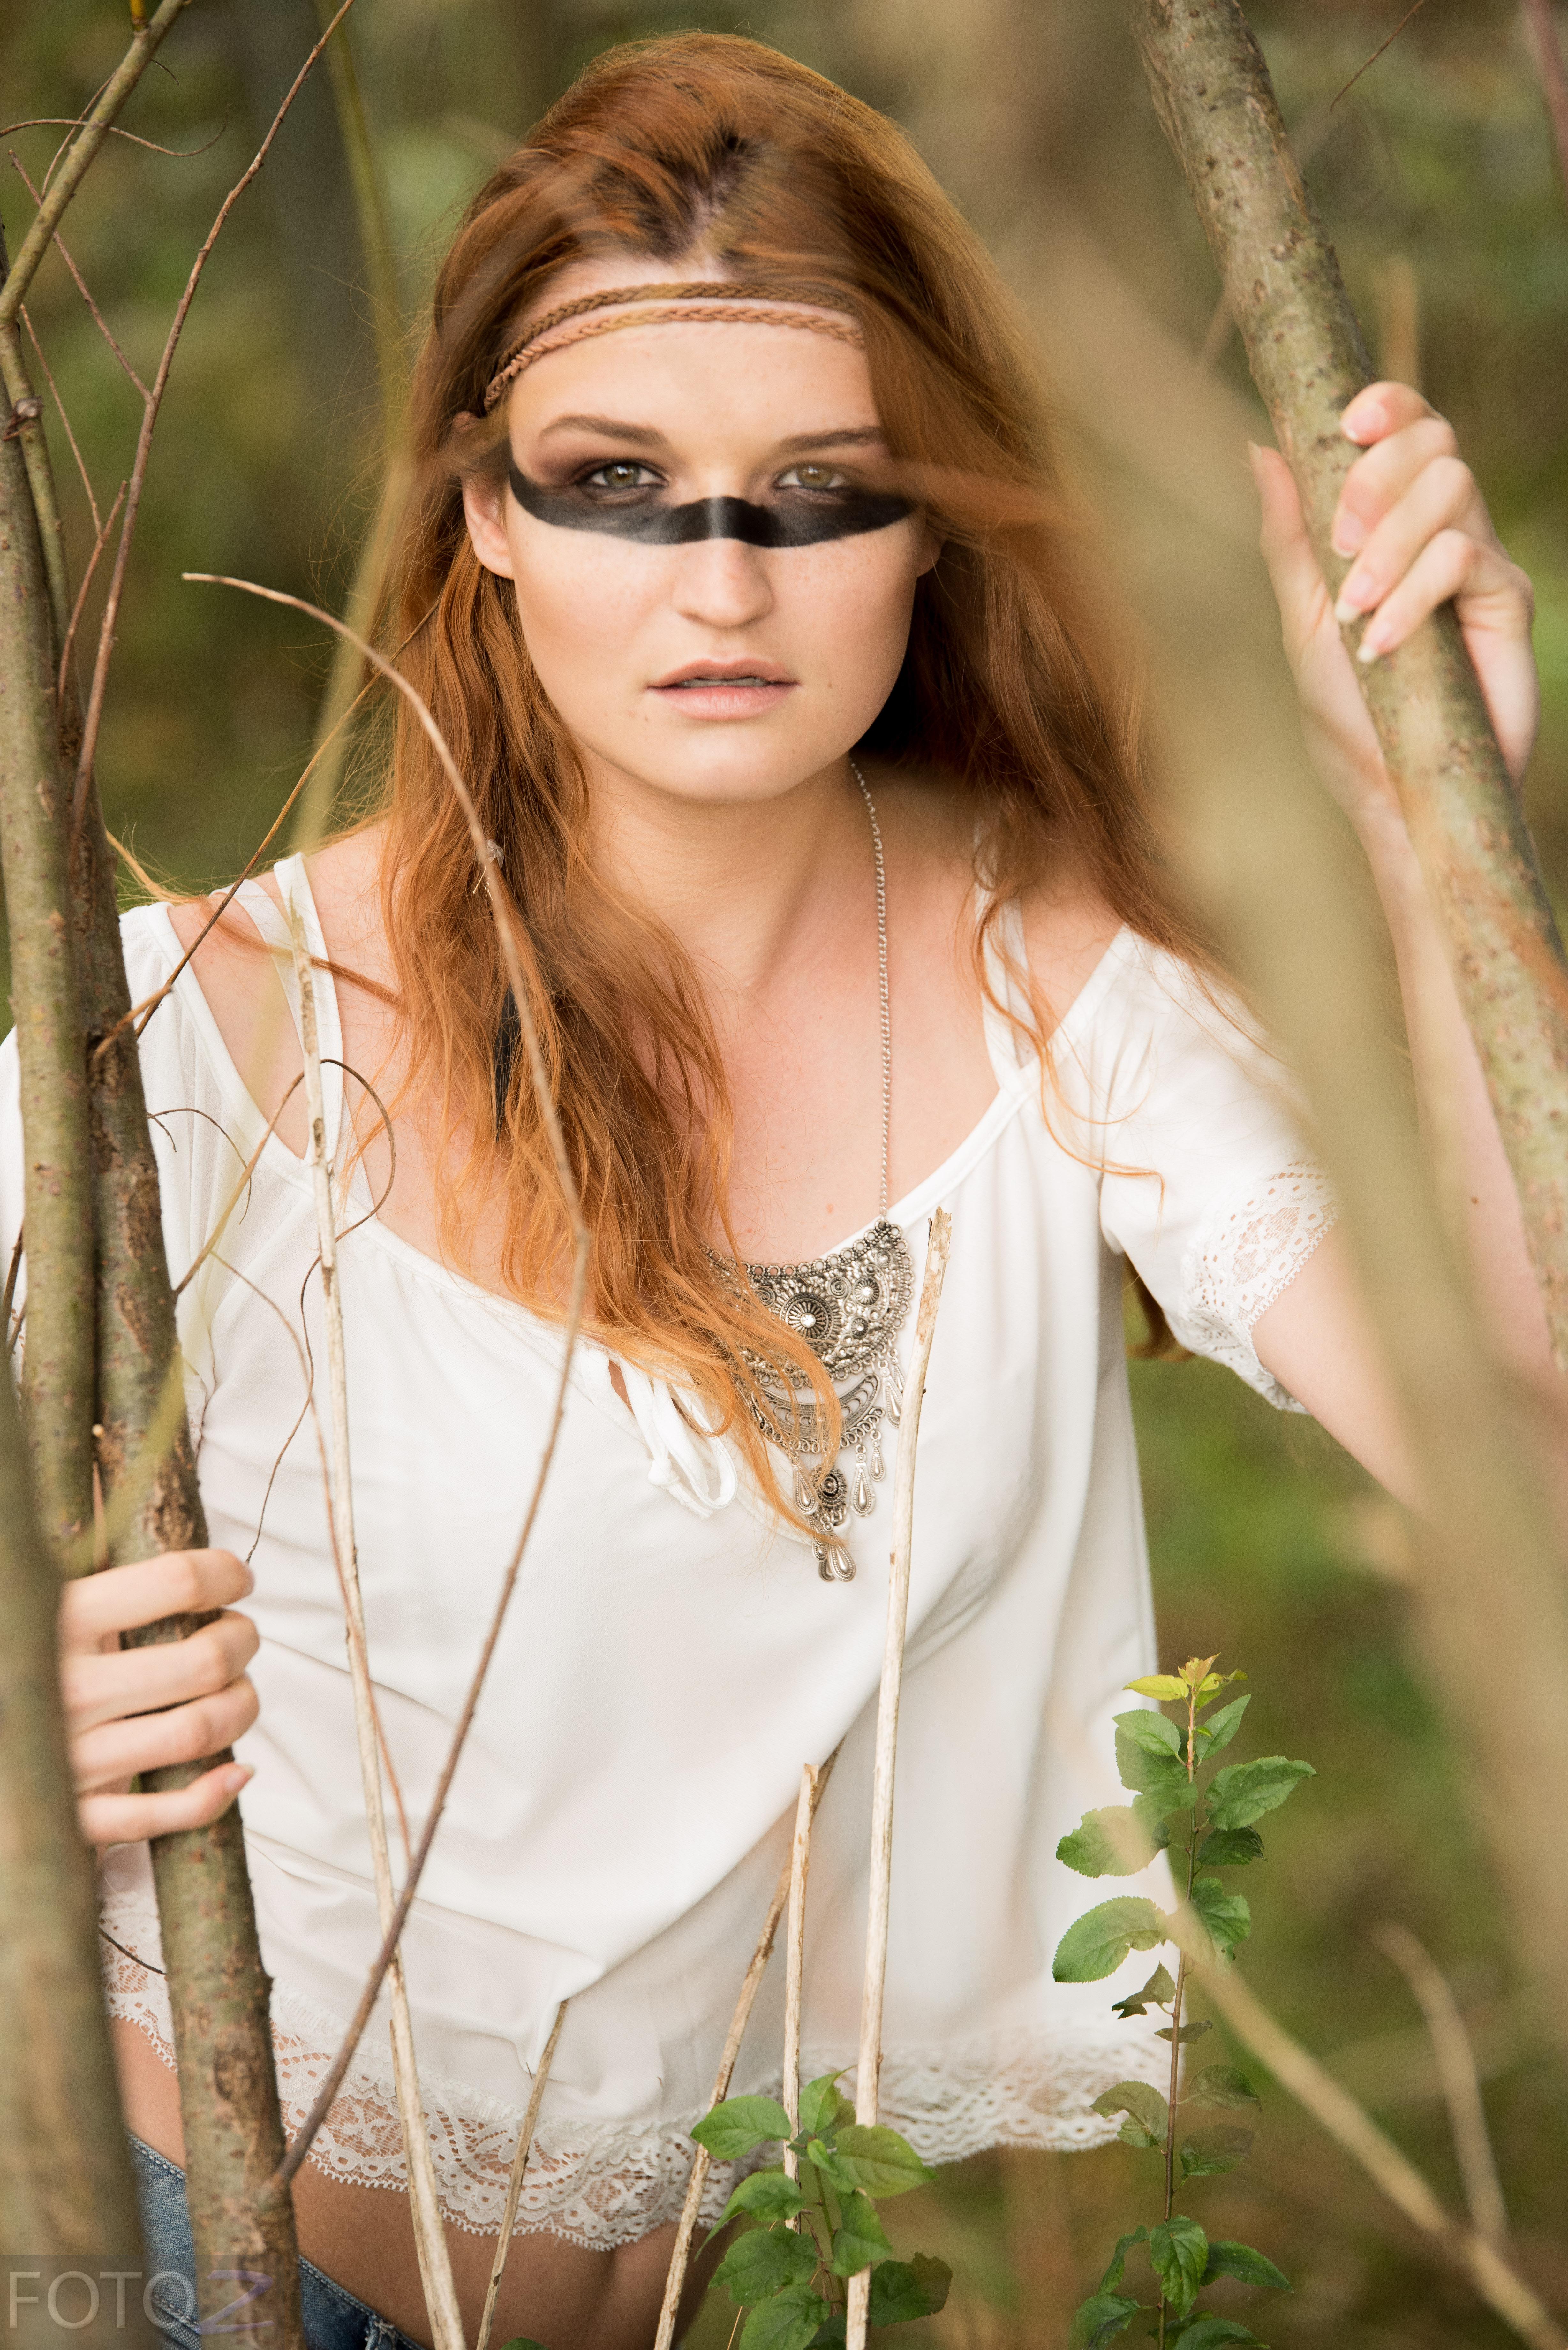 Model Tanja